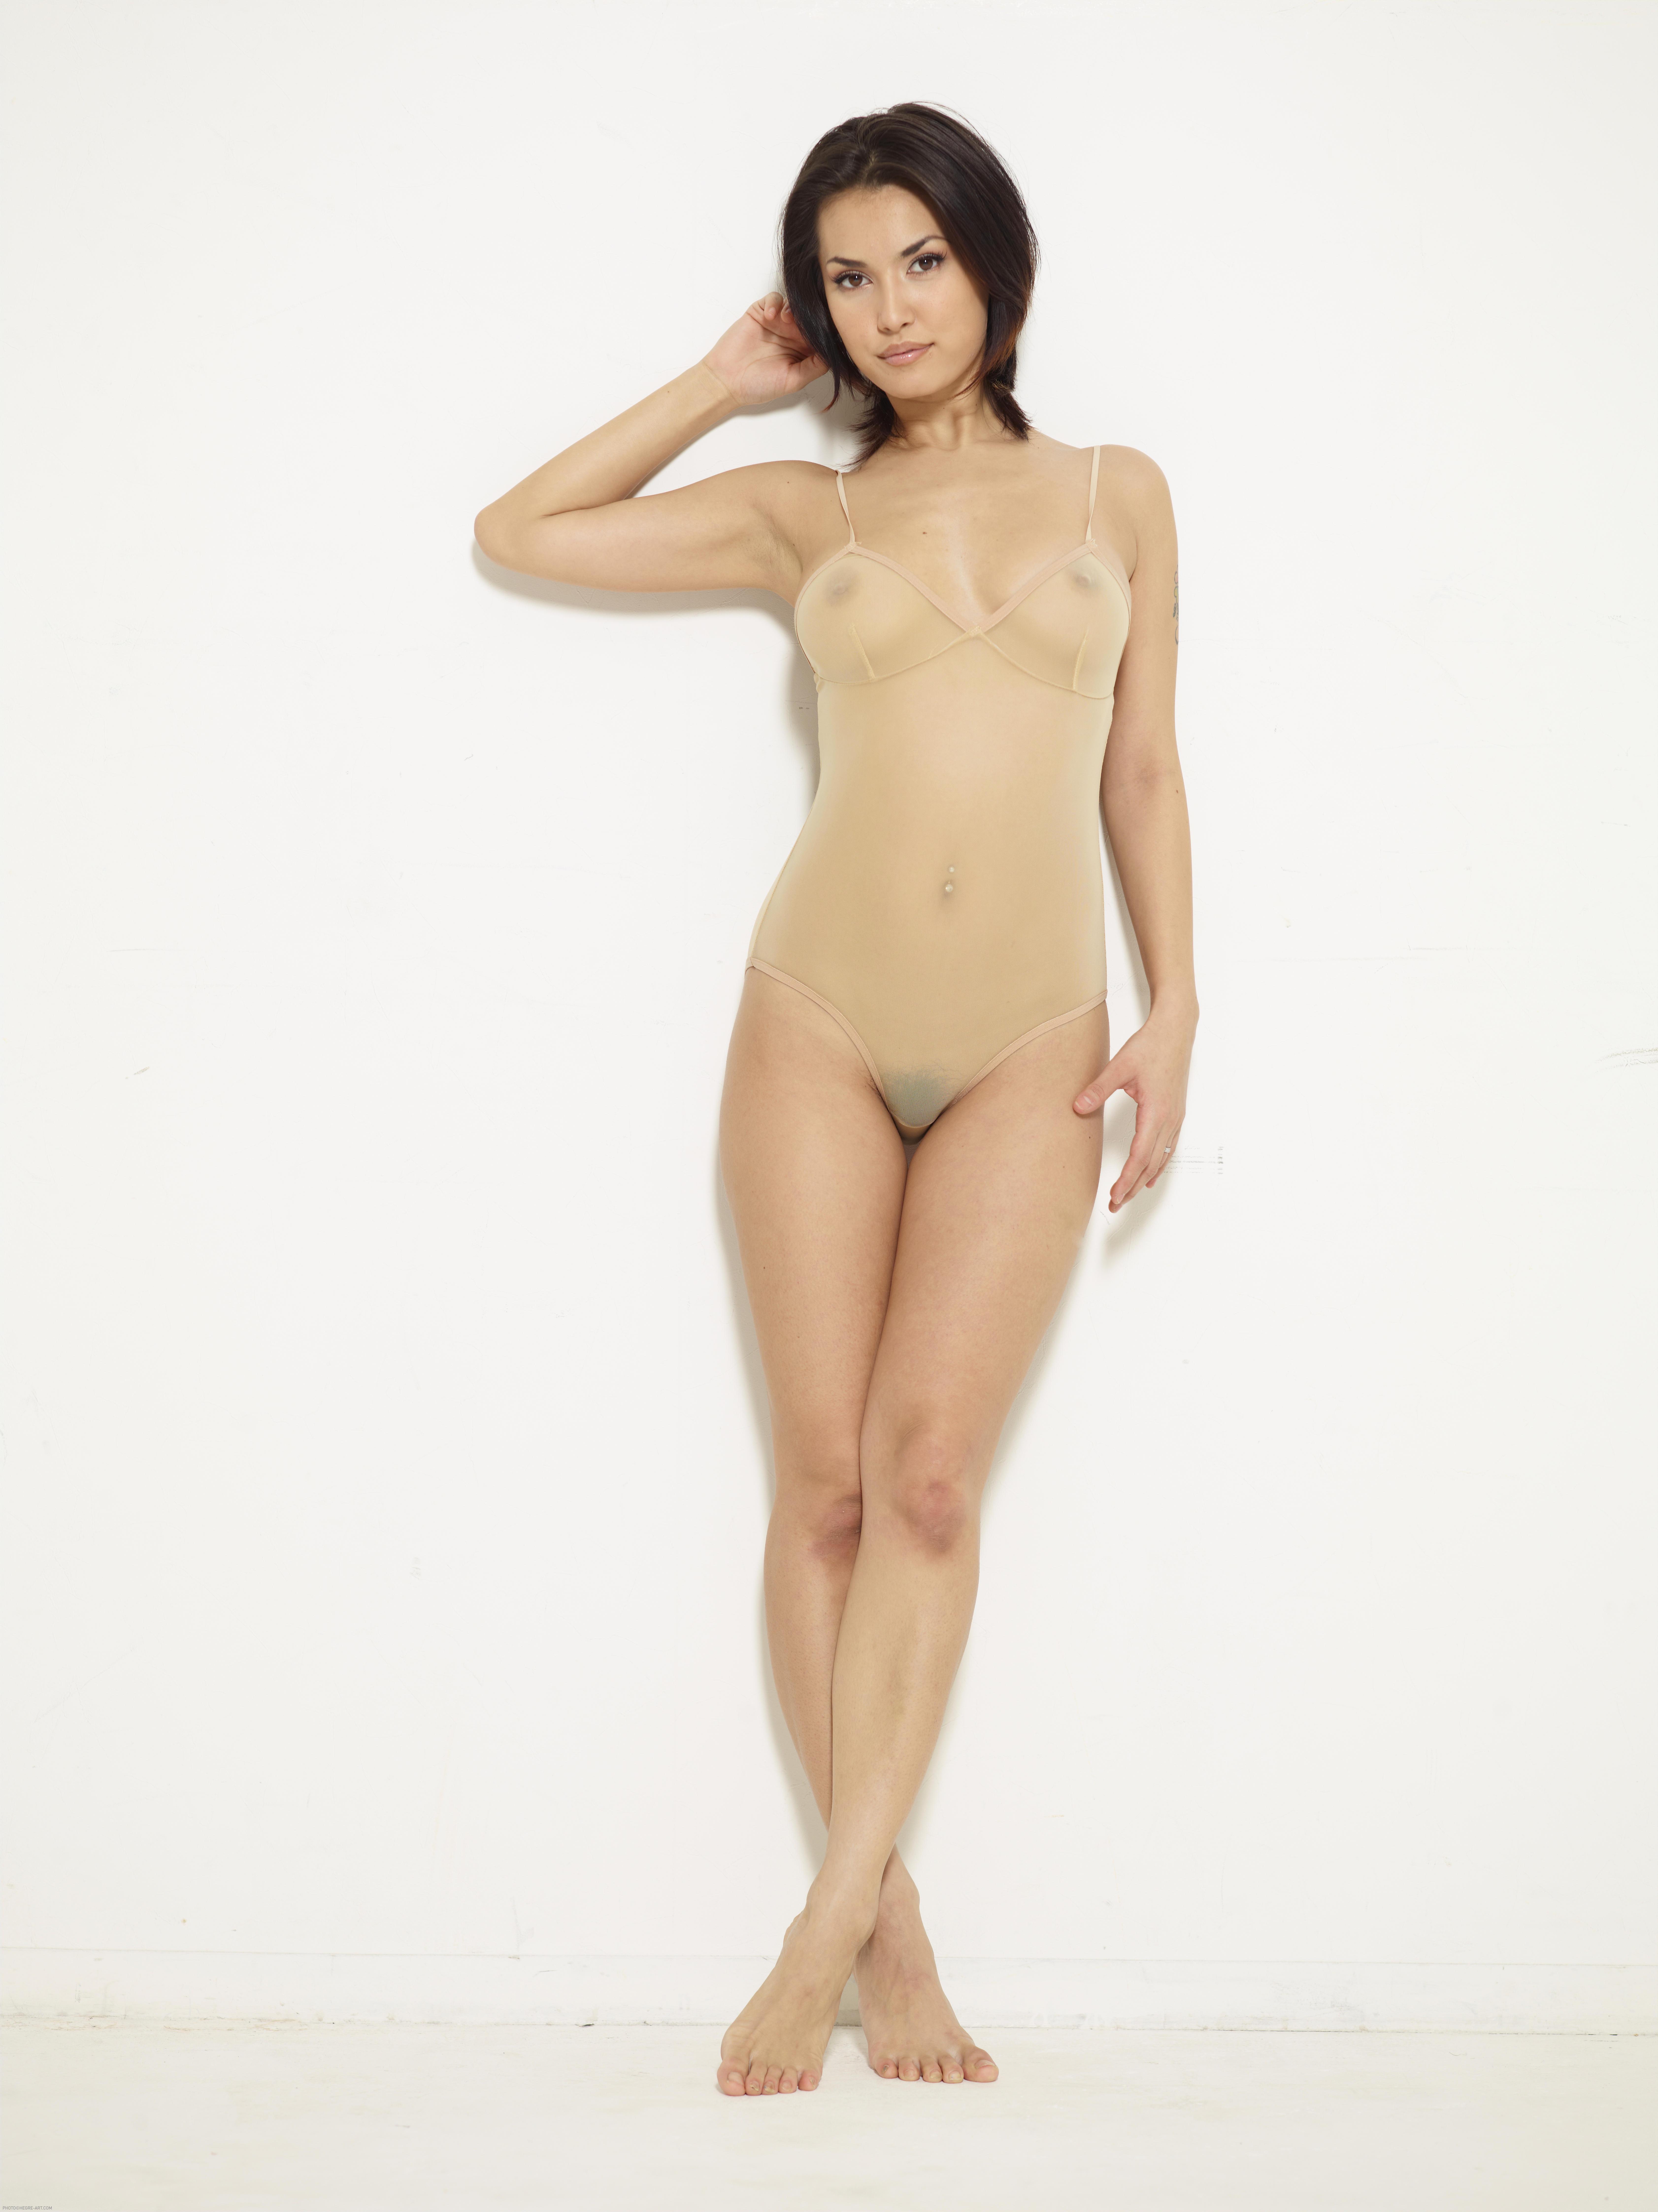 Maria Ozawa Transparent 2011 01 09 014 xxxxl (MariaOzawaTransparent ...